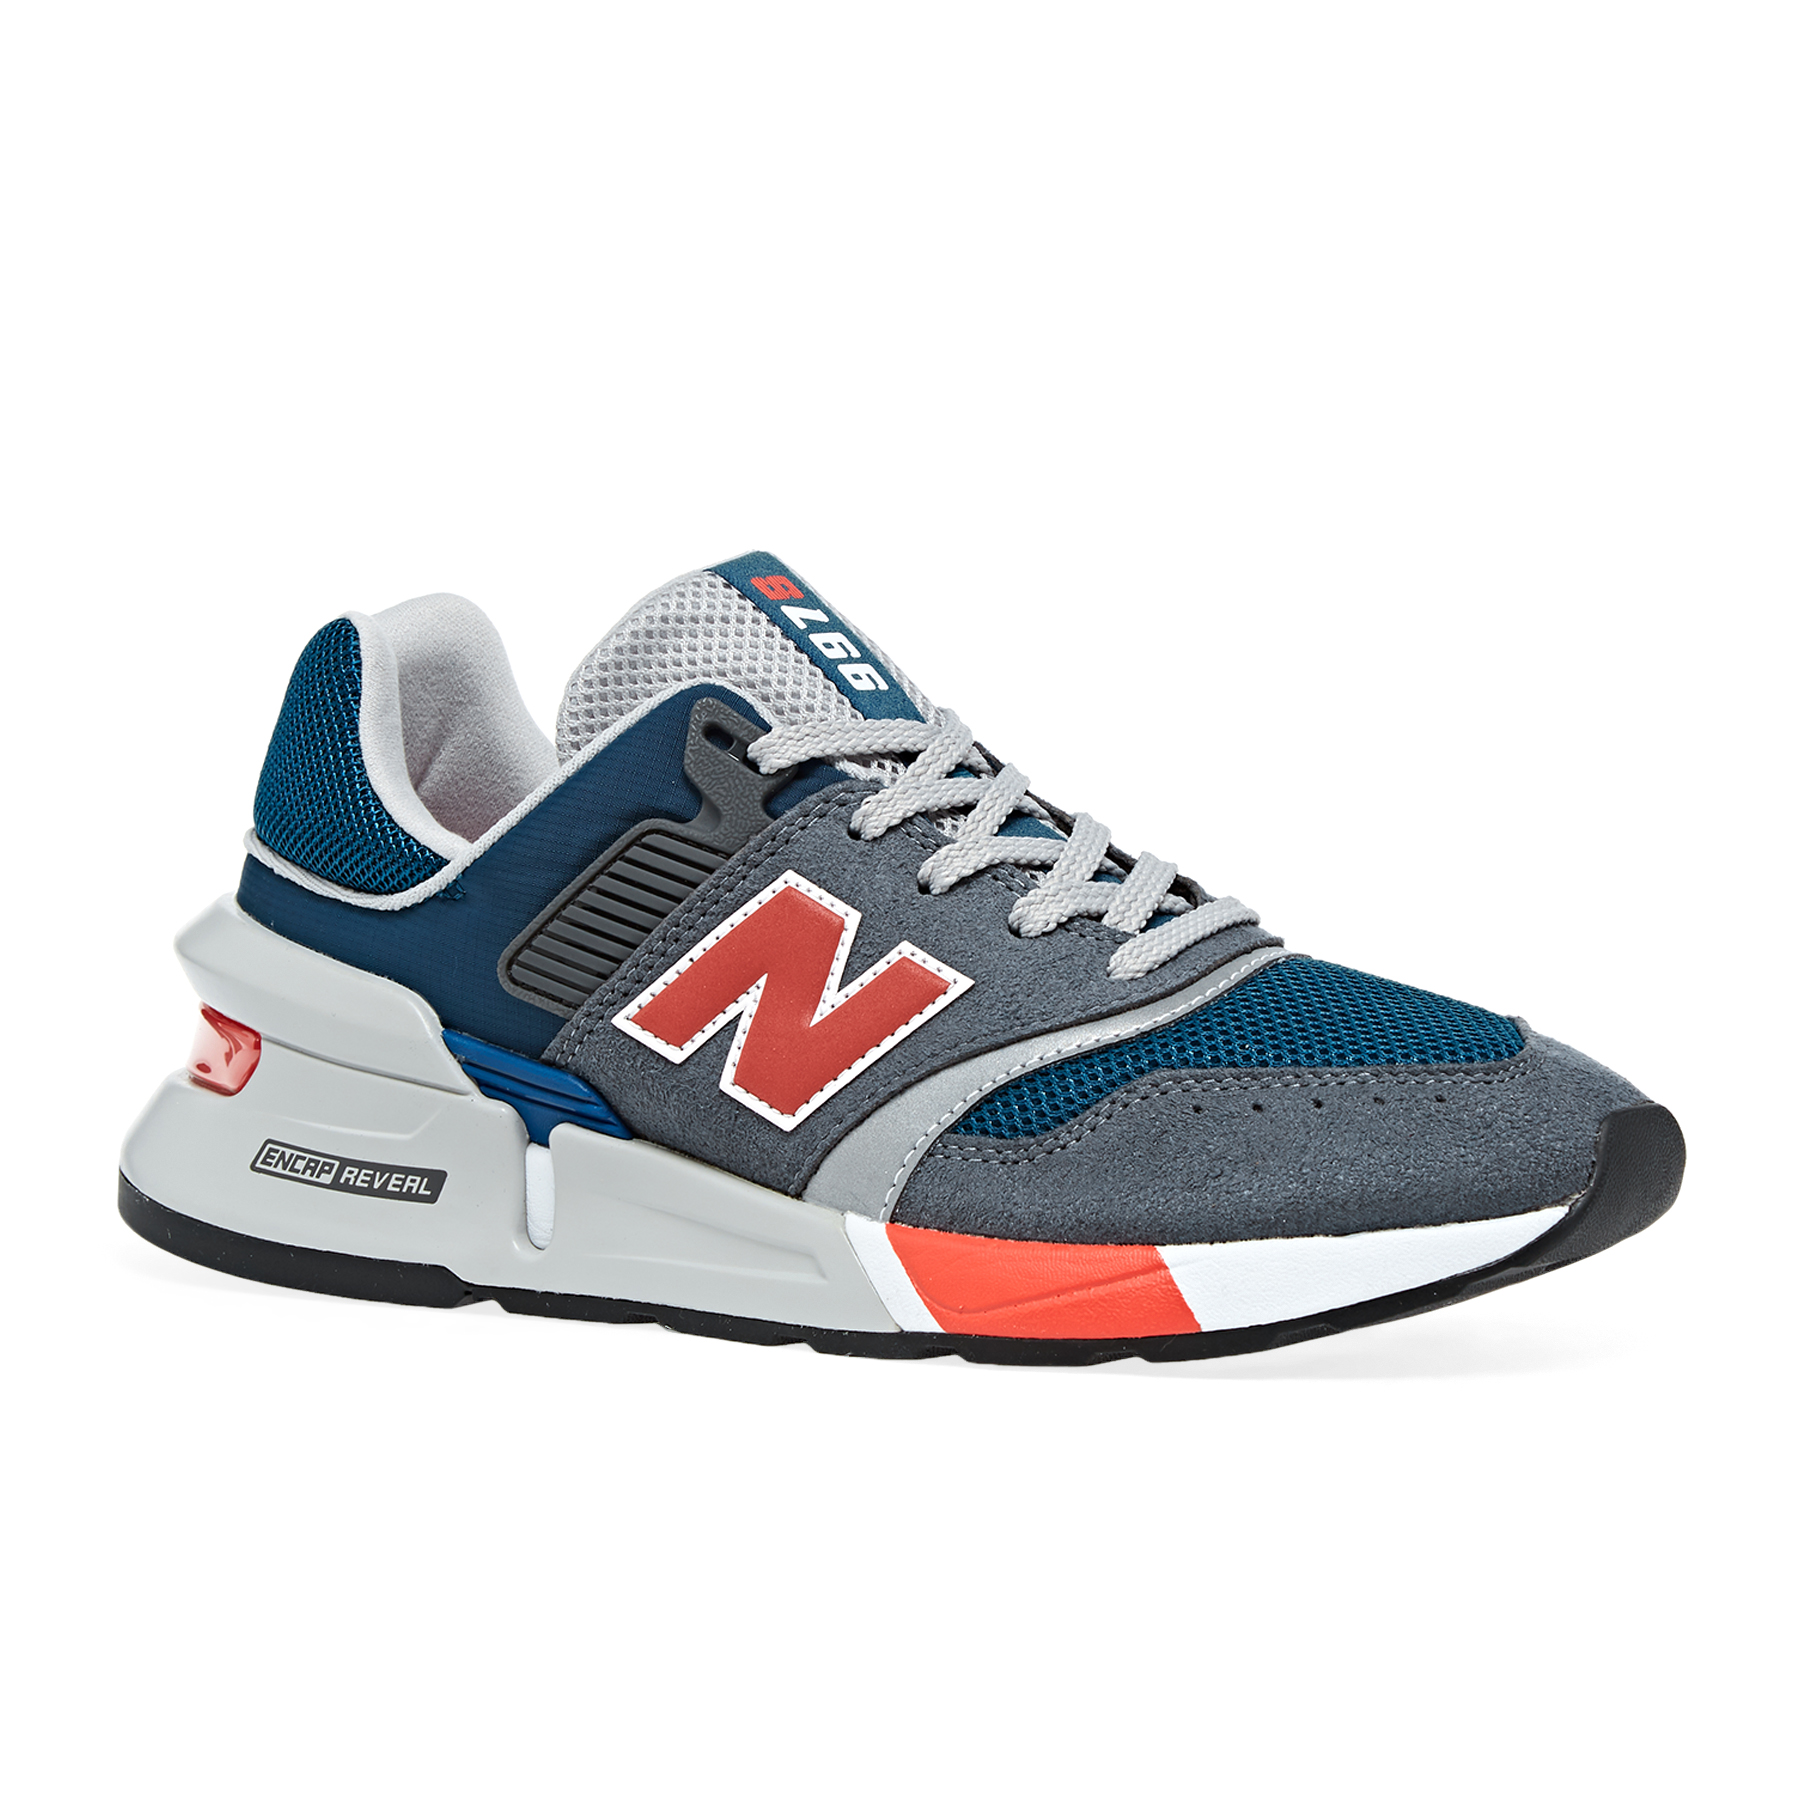 new balance womens shoes near me